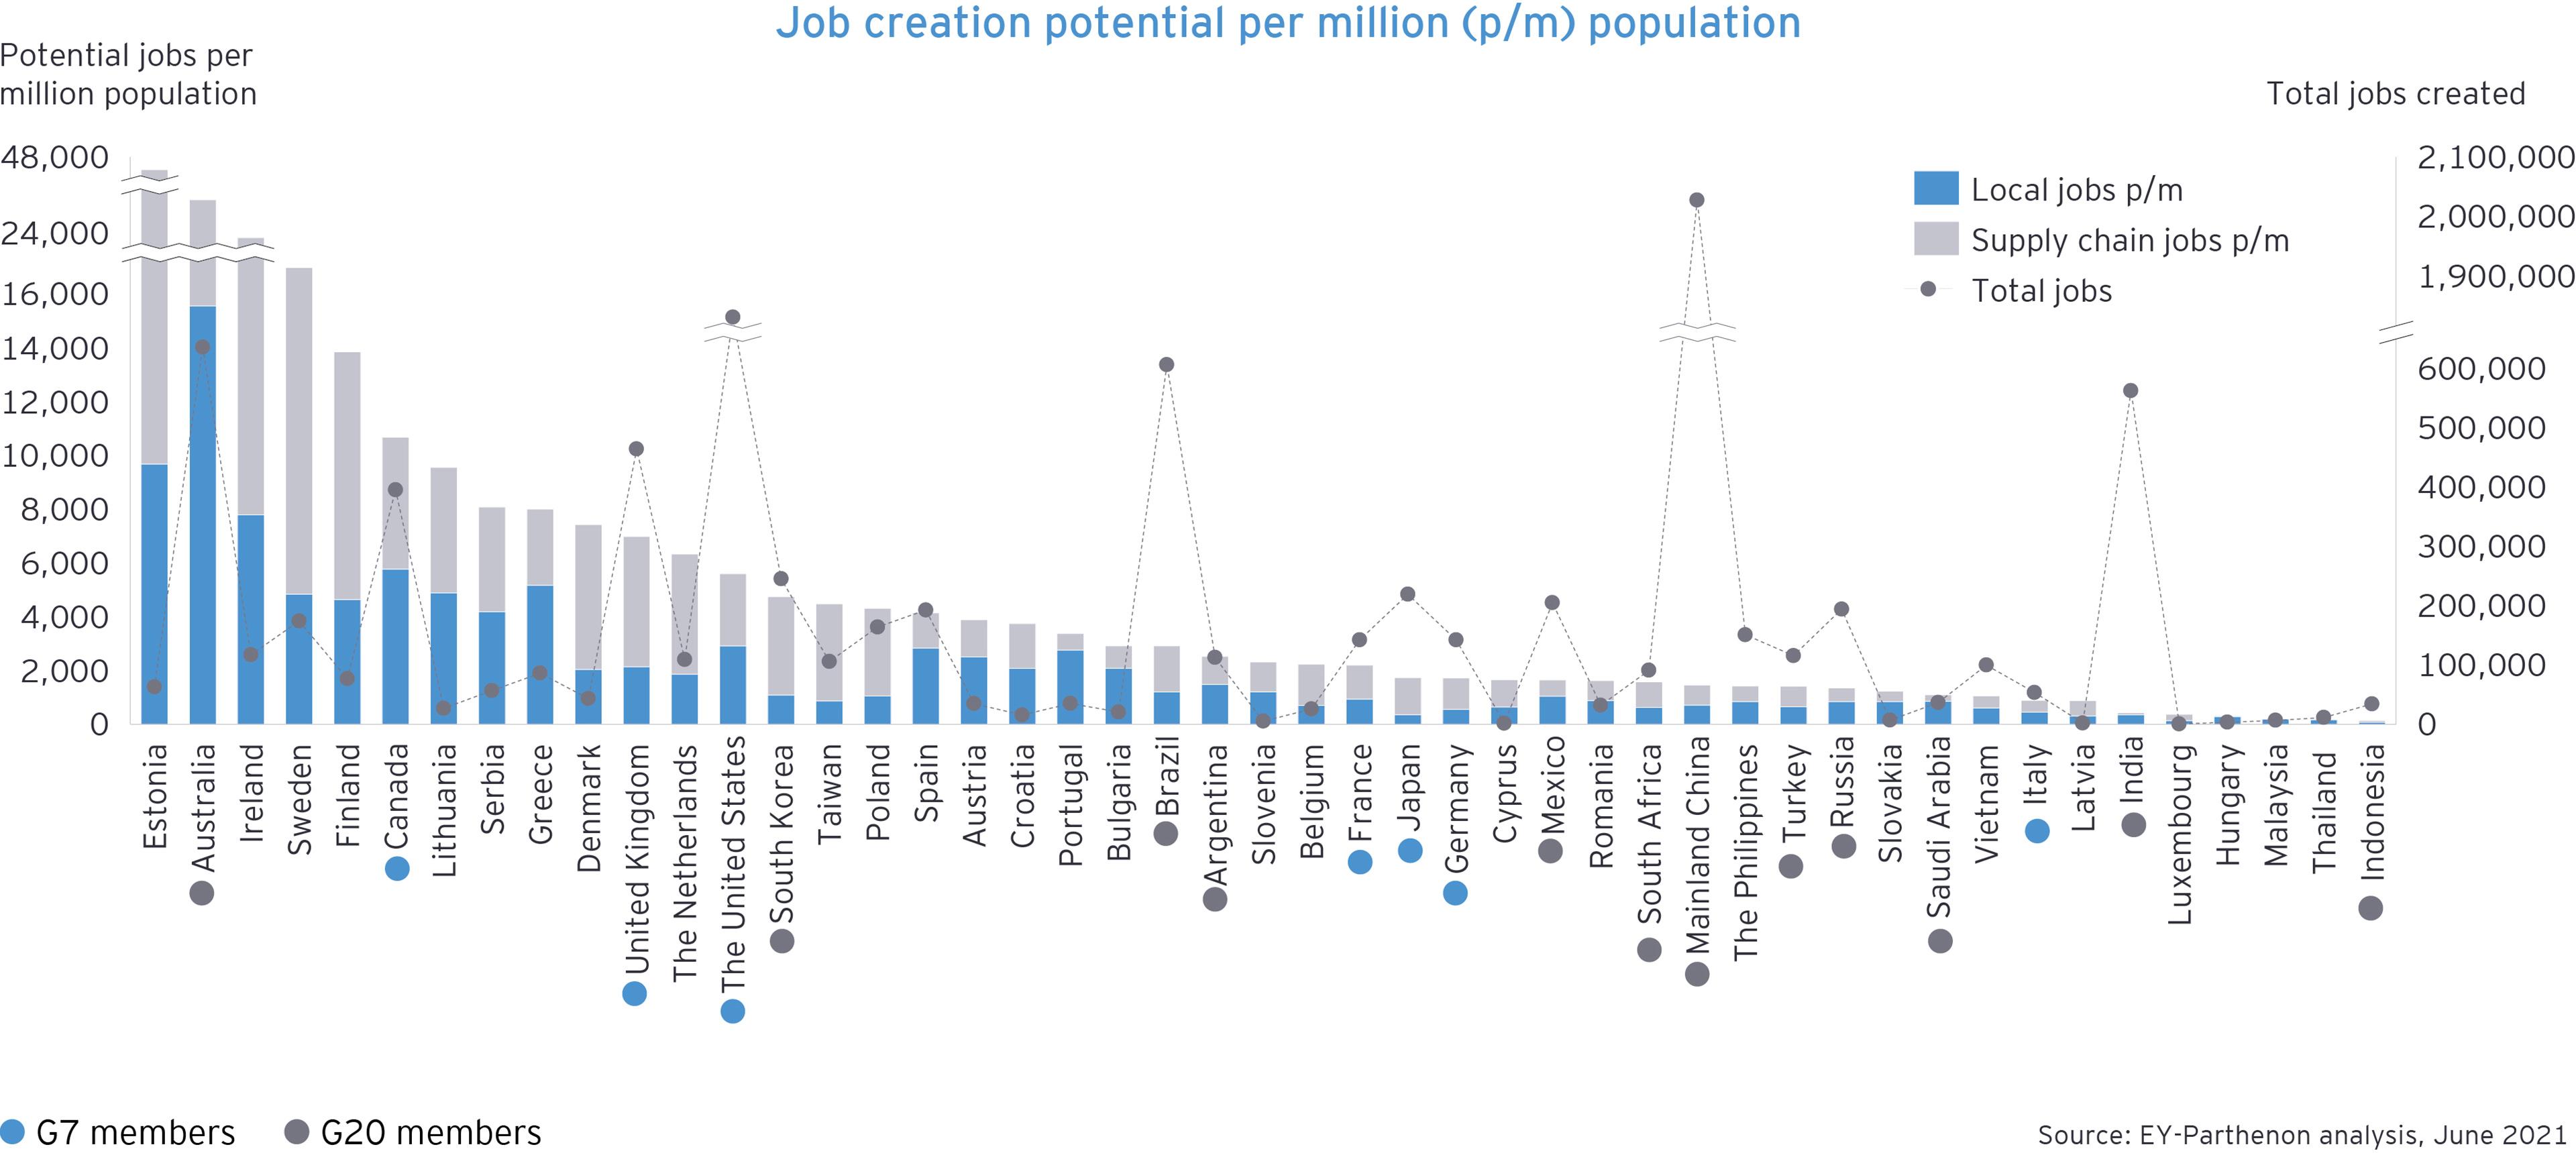 Job creation potential per million population chart 1